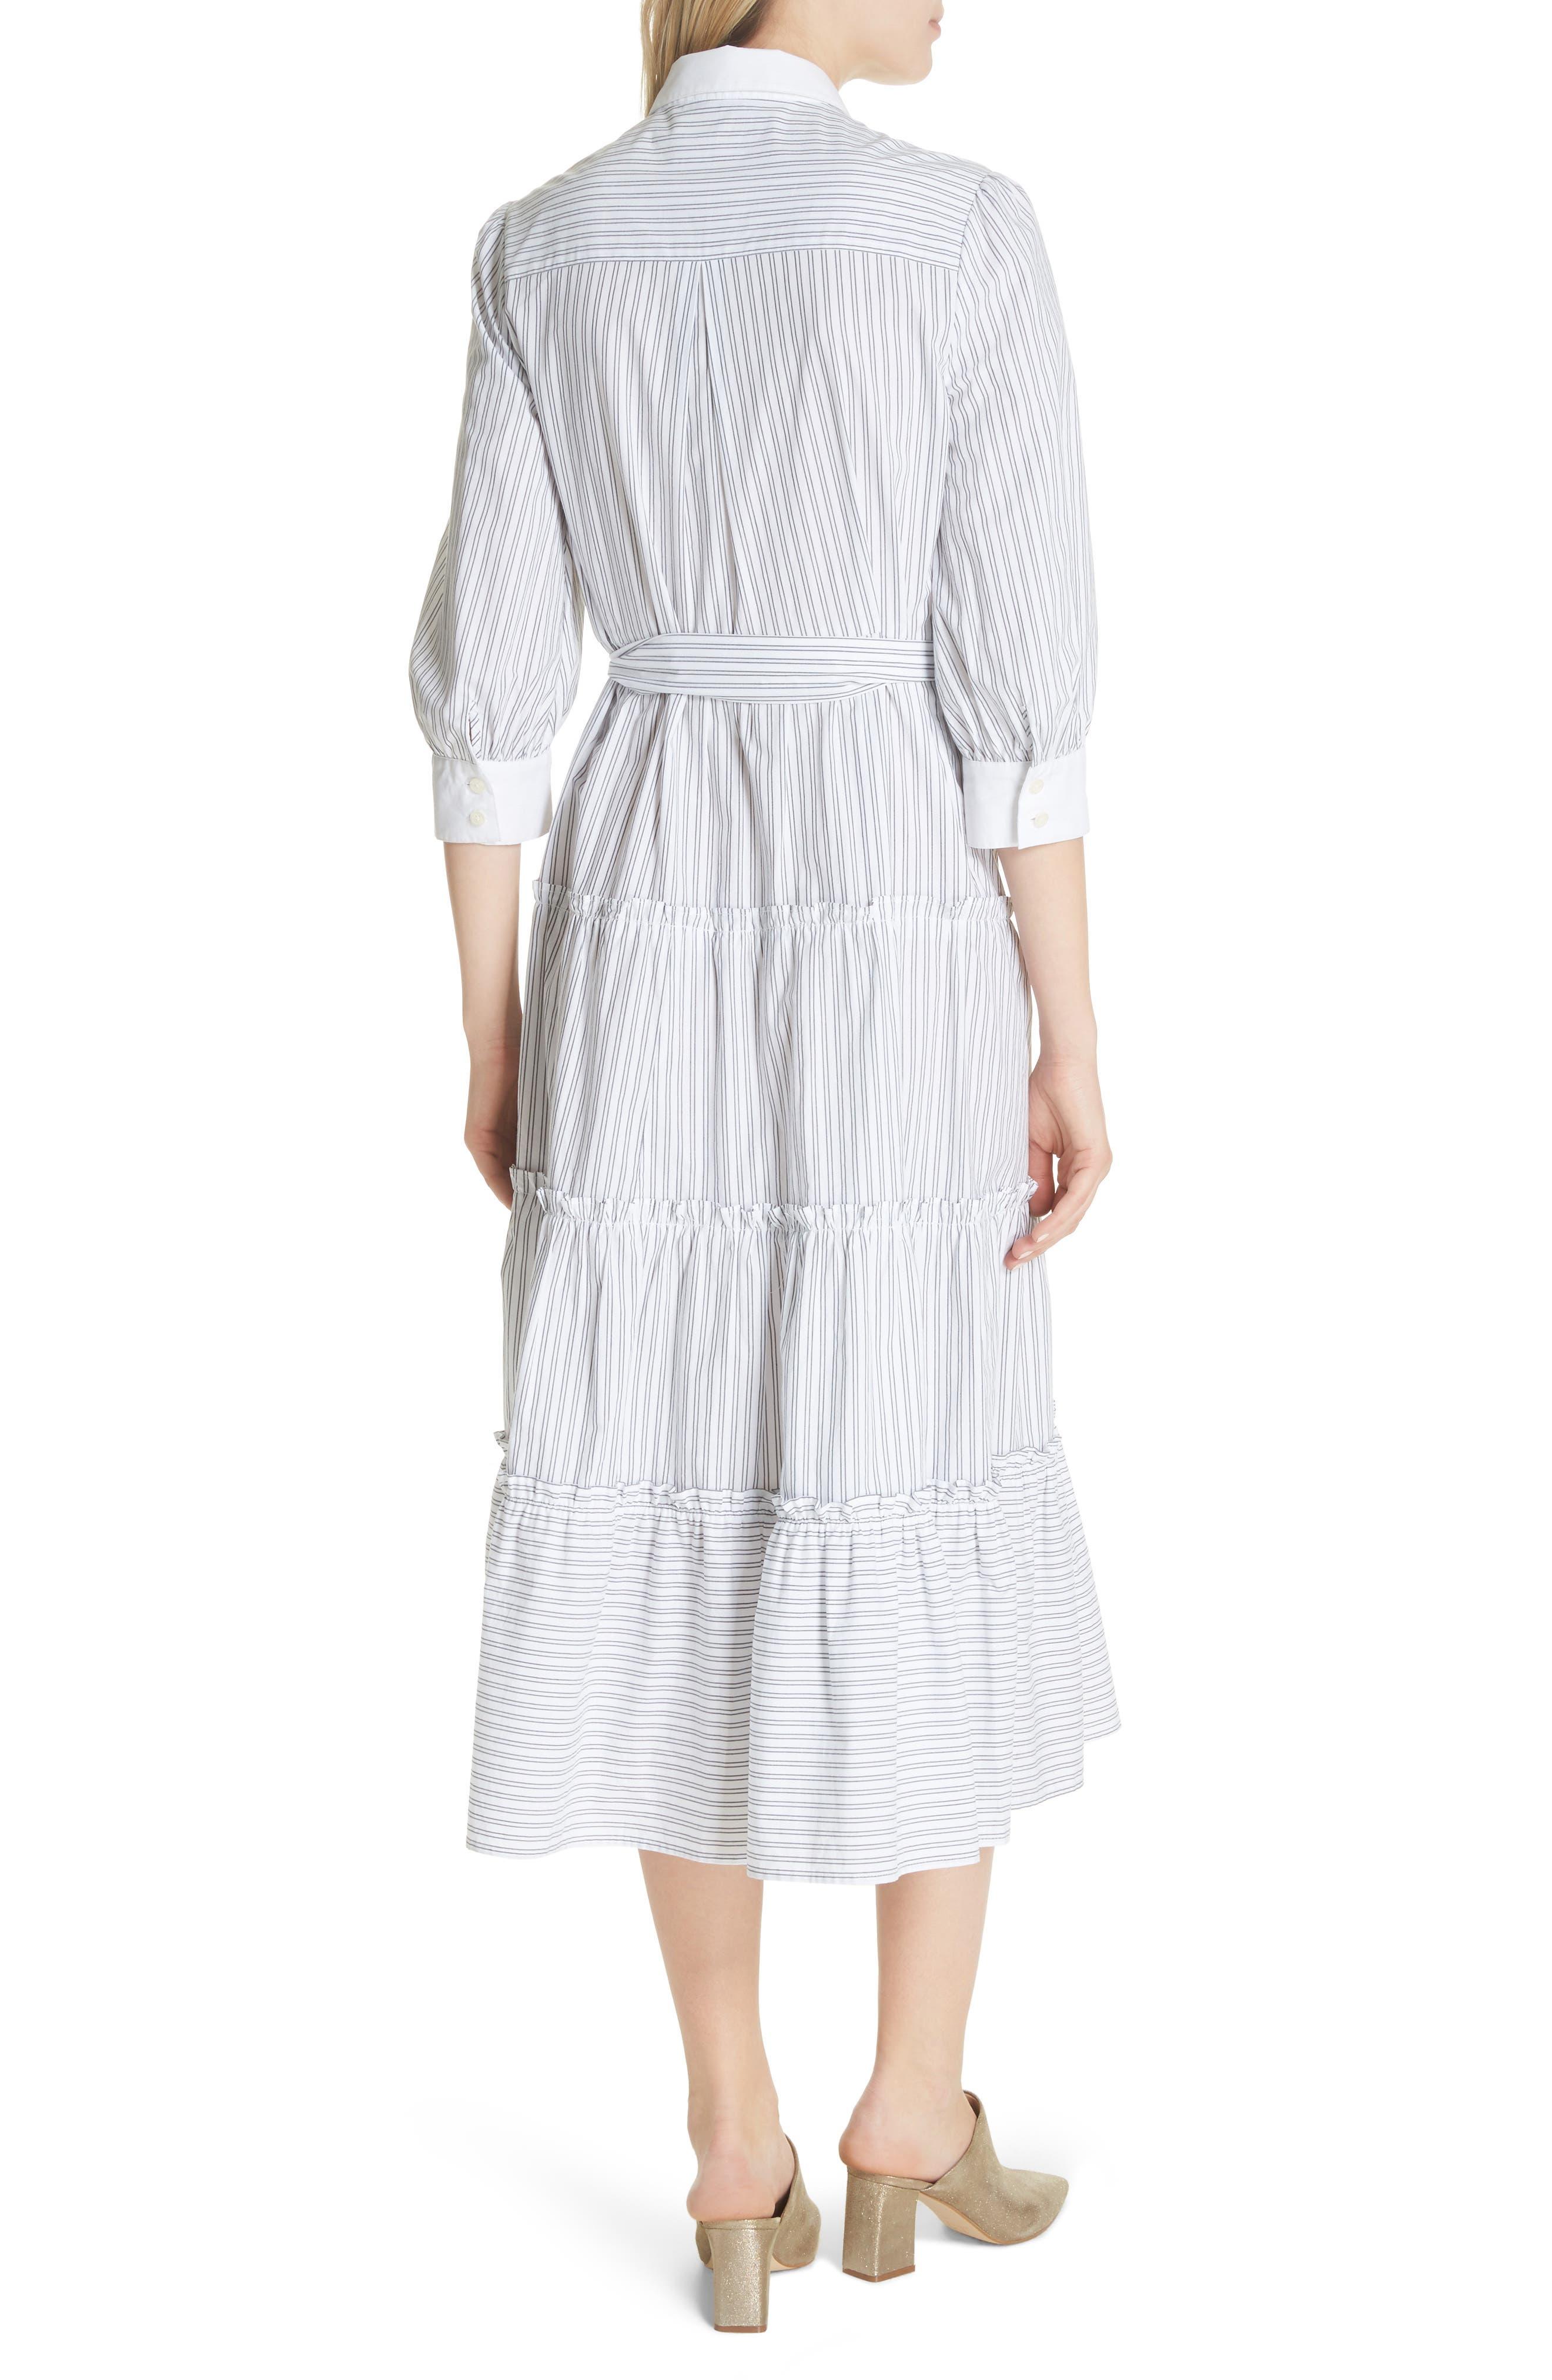 embroidered ruffle trim shirtdress,                             Alternate thumbnail 2, color,                             Fresh White/ Black